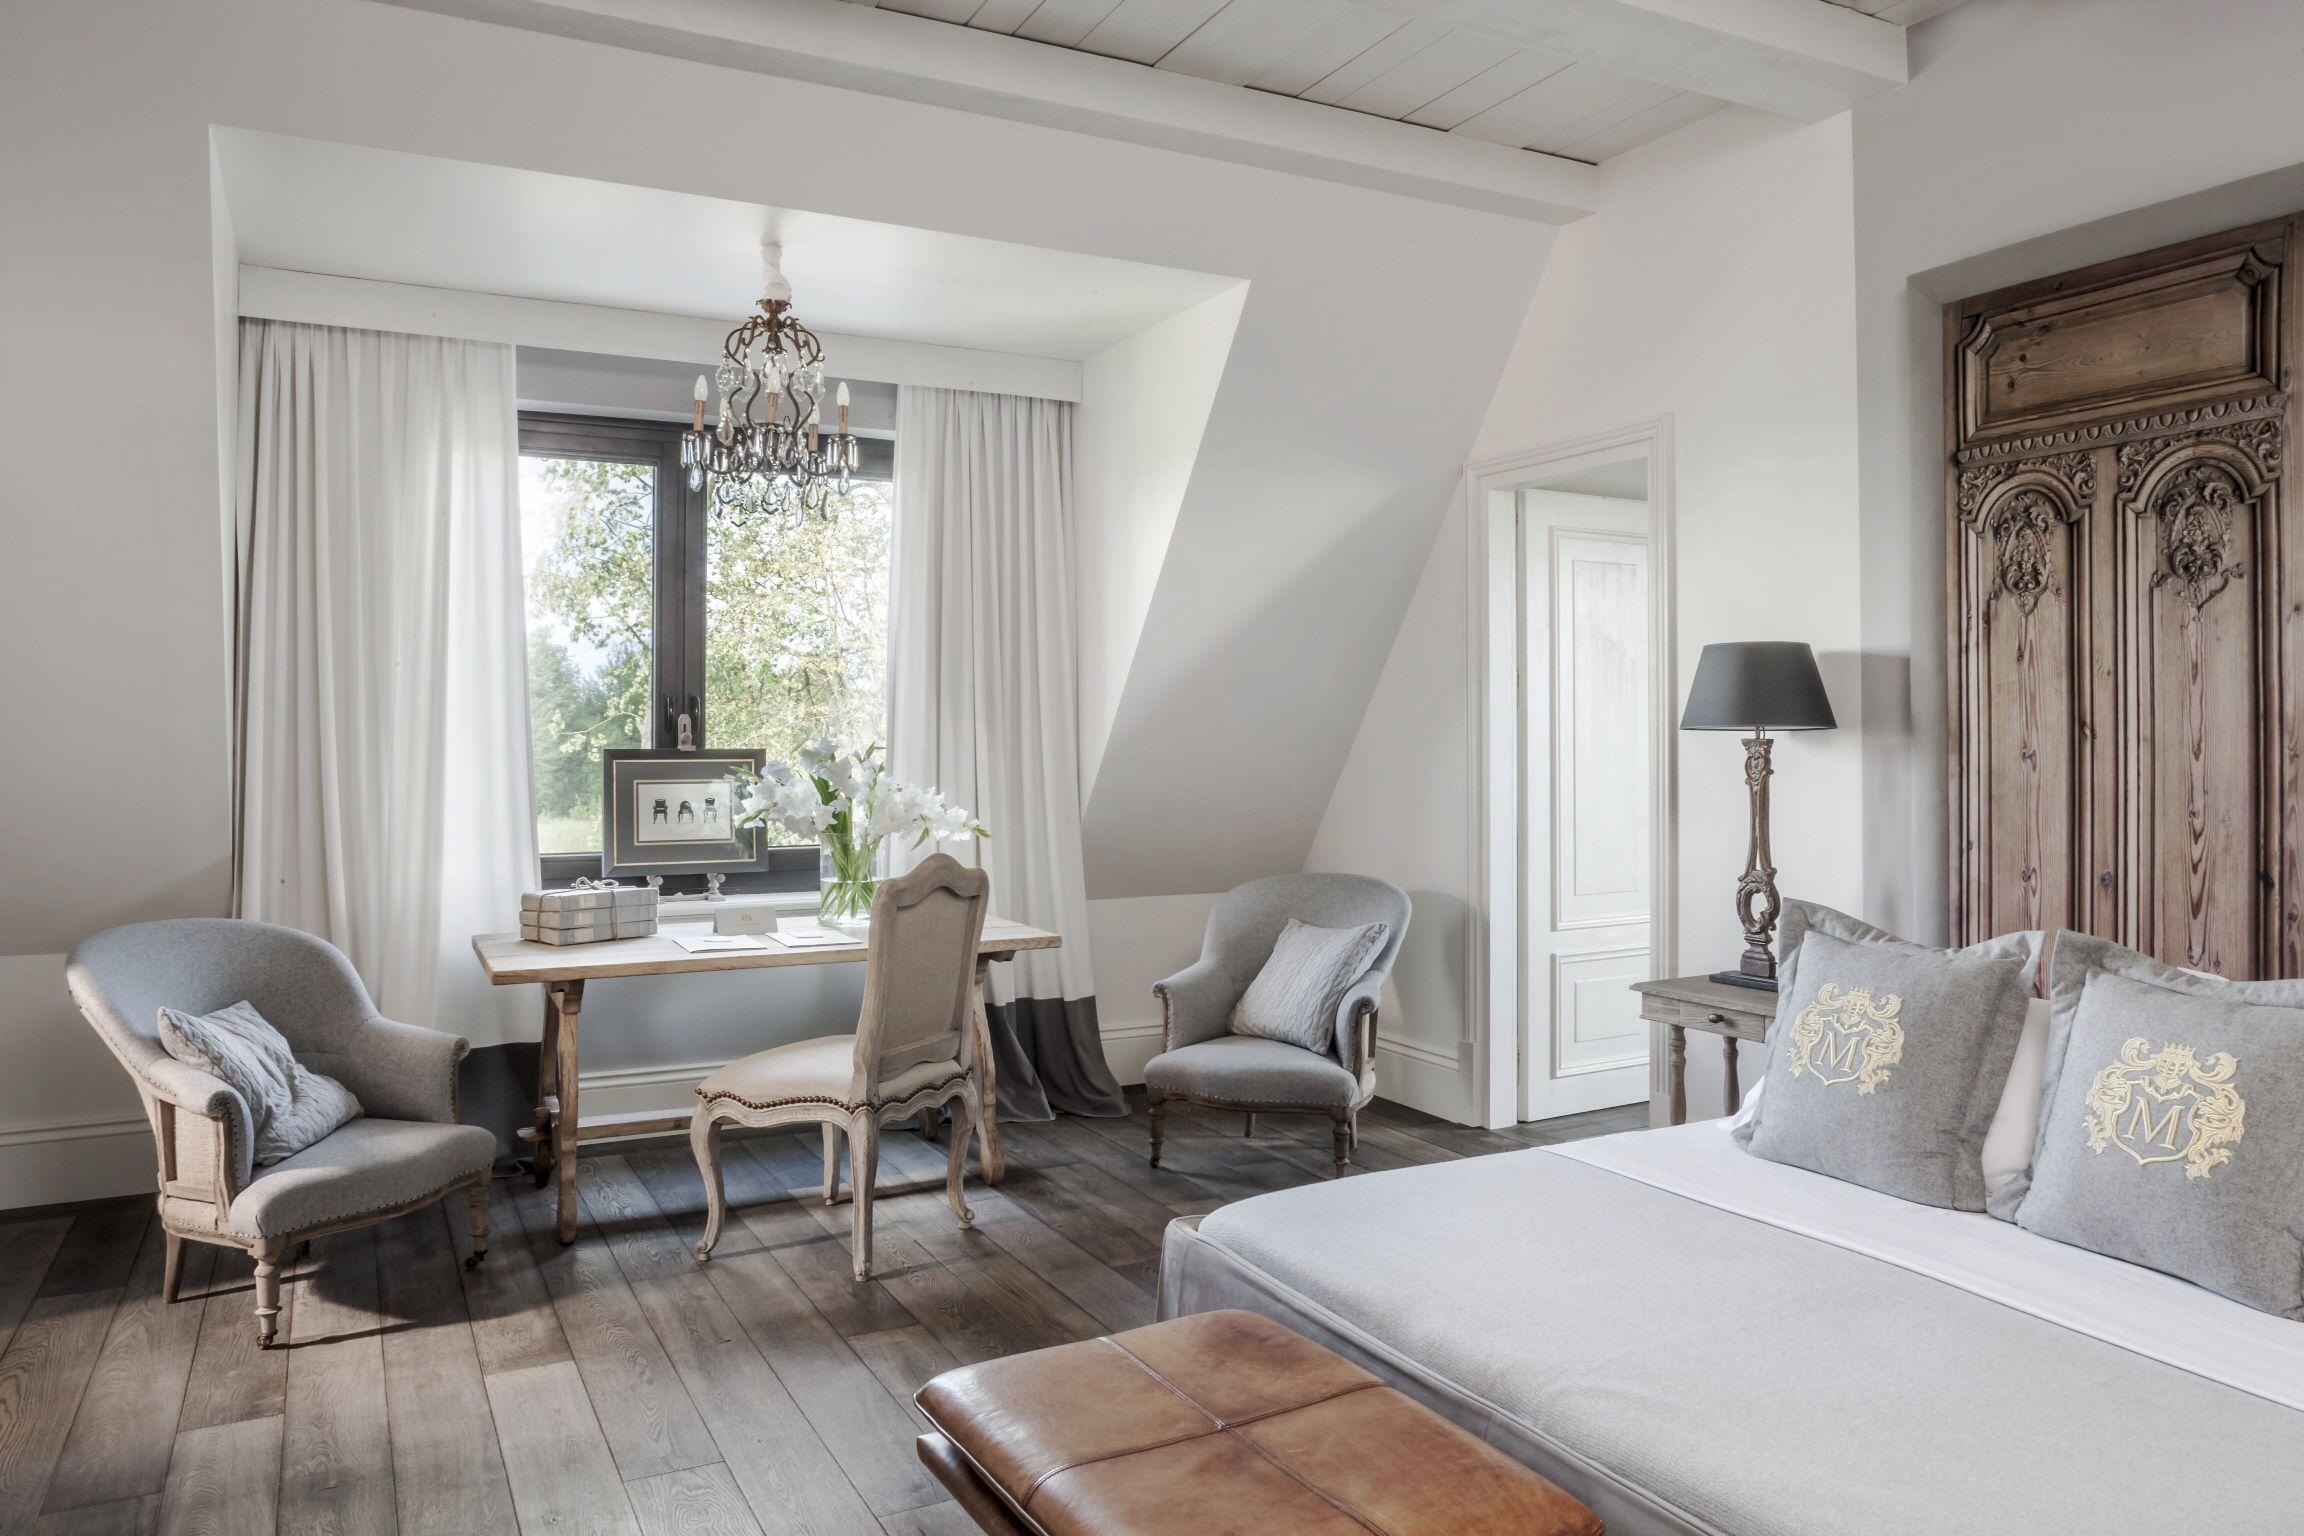 Aleksandra miecznicka interior design 8 ~ beautifully designed ...